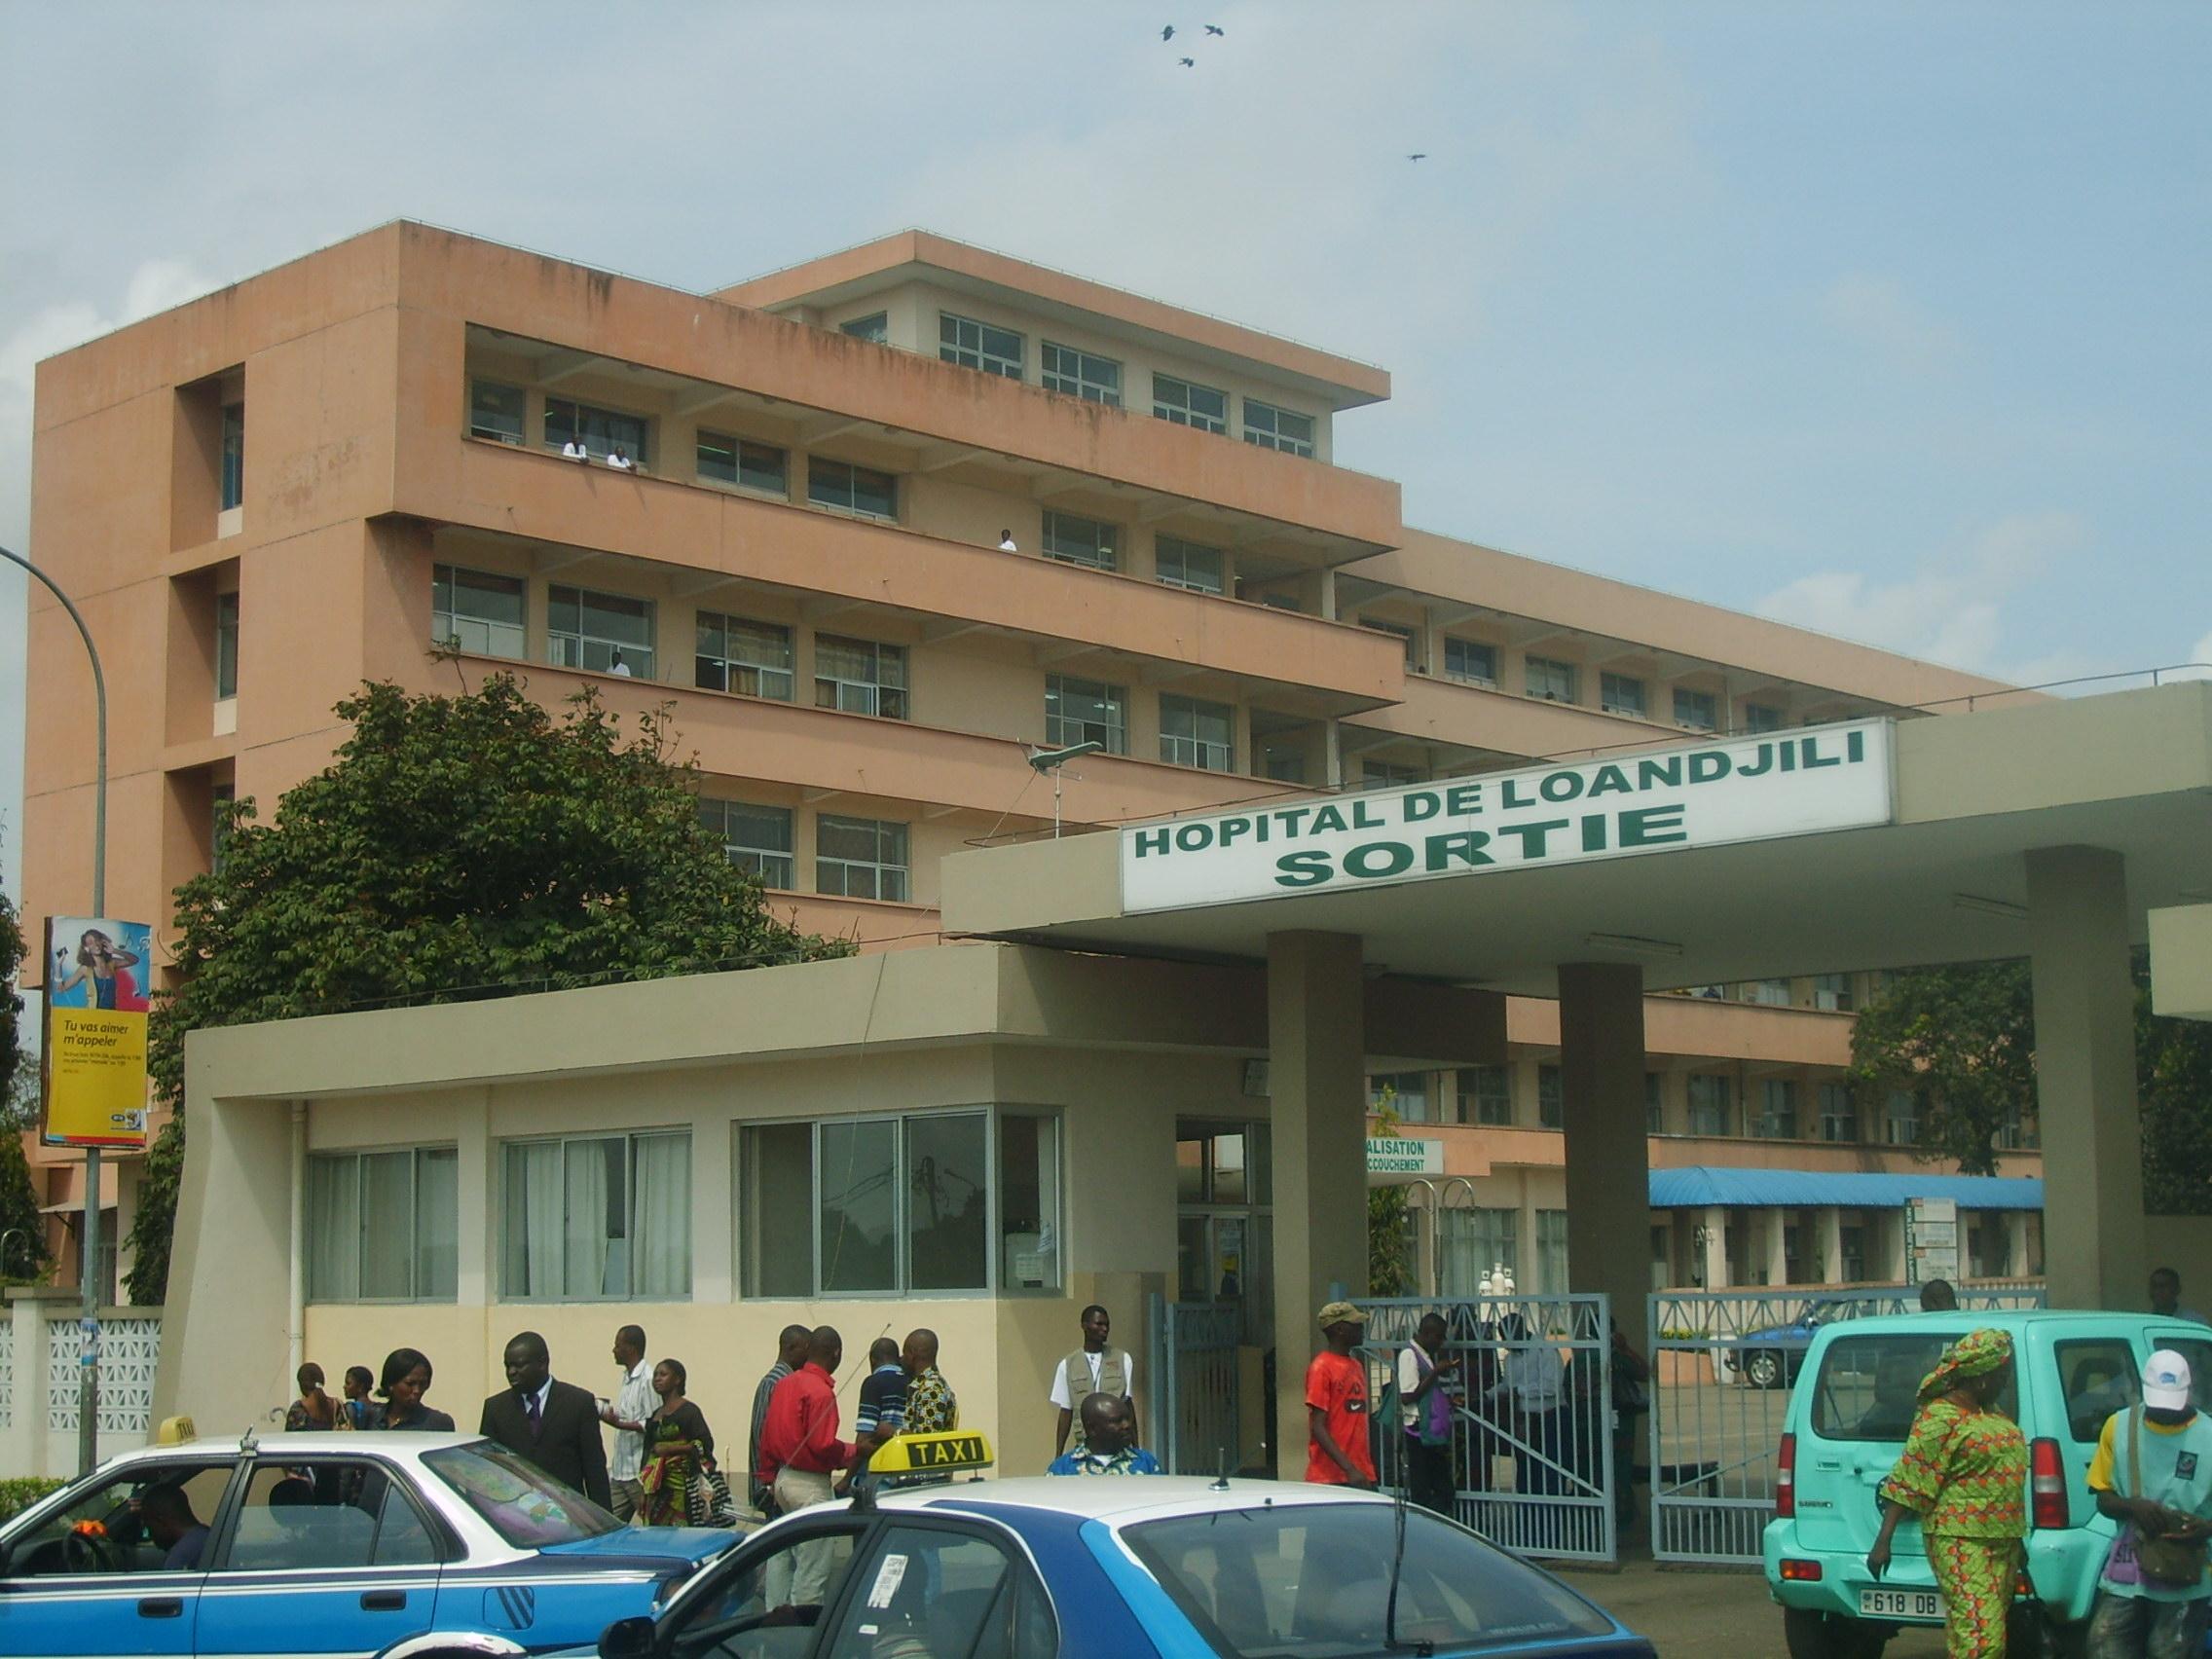 Hôpital général de Loandjili